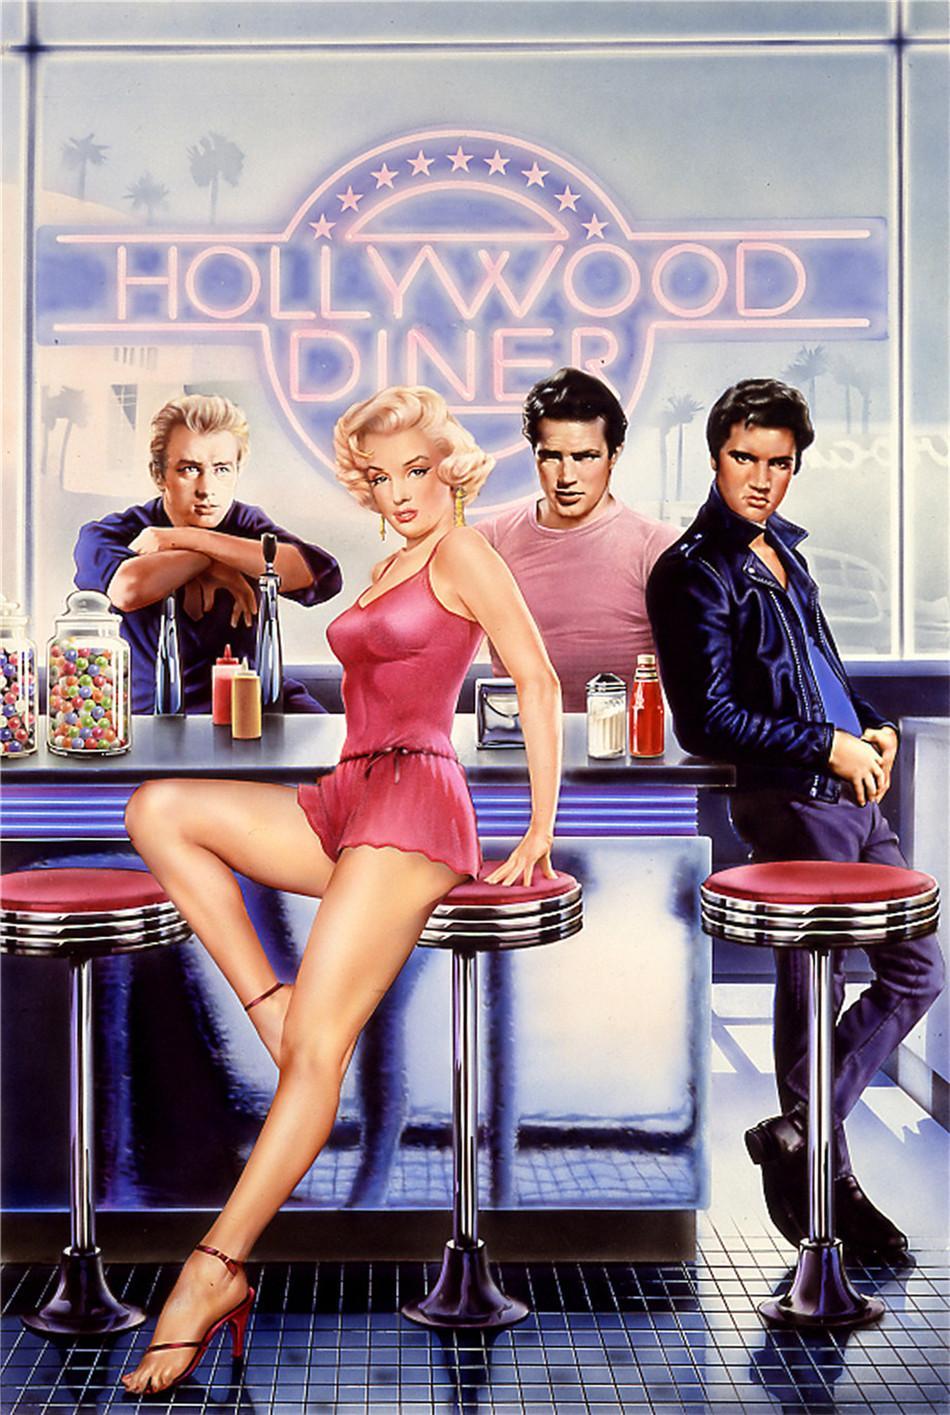 2019 Marilyn Monroe James Dean Elvis Presley Humphrey Bogarhome